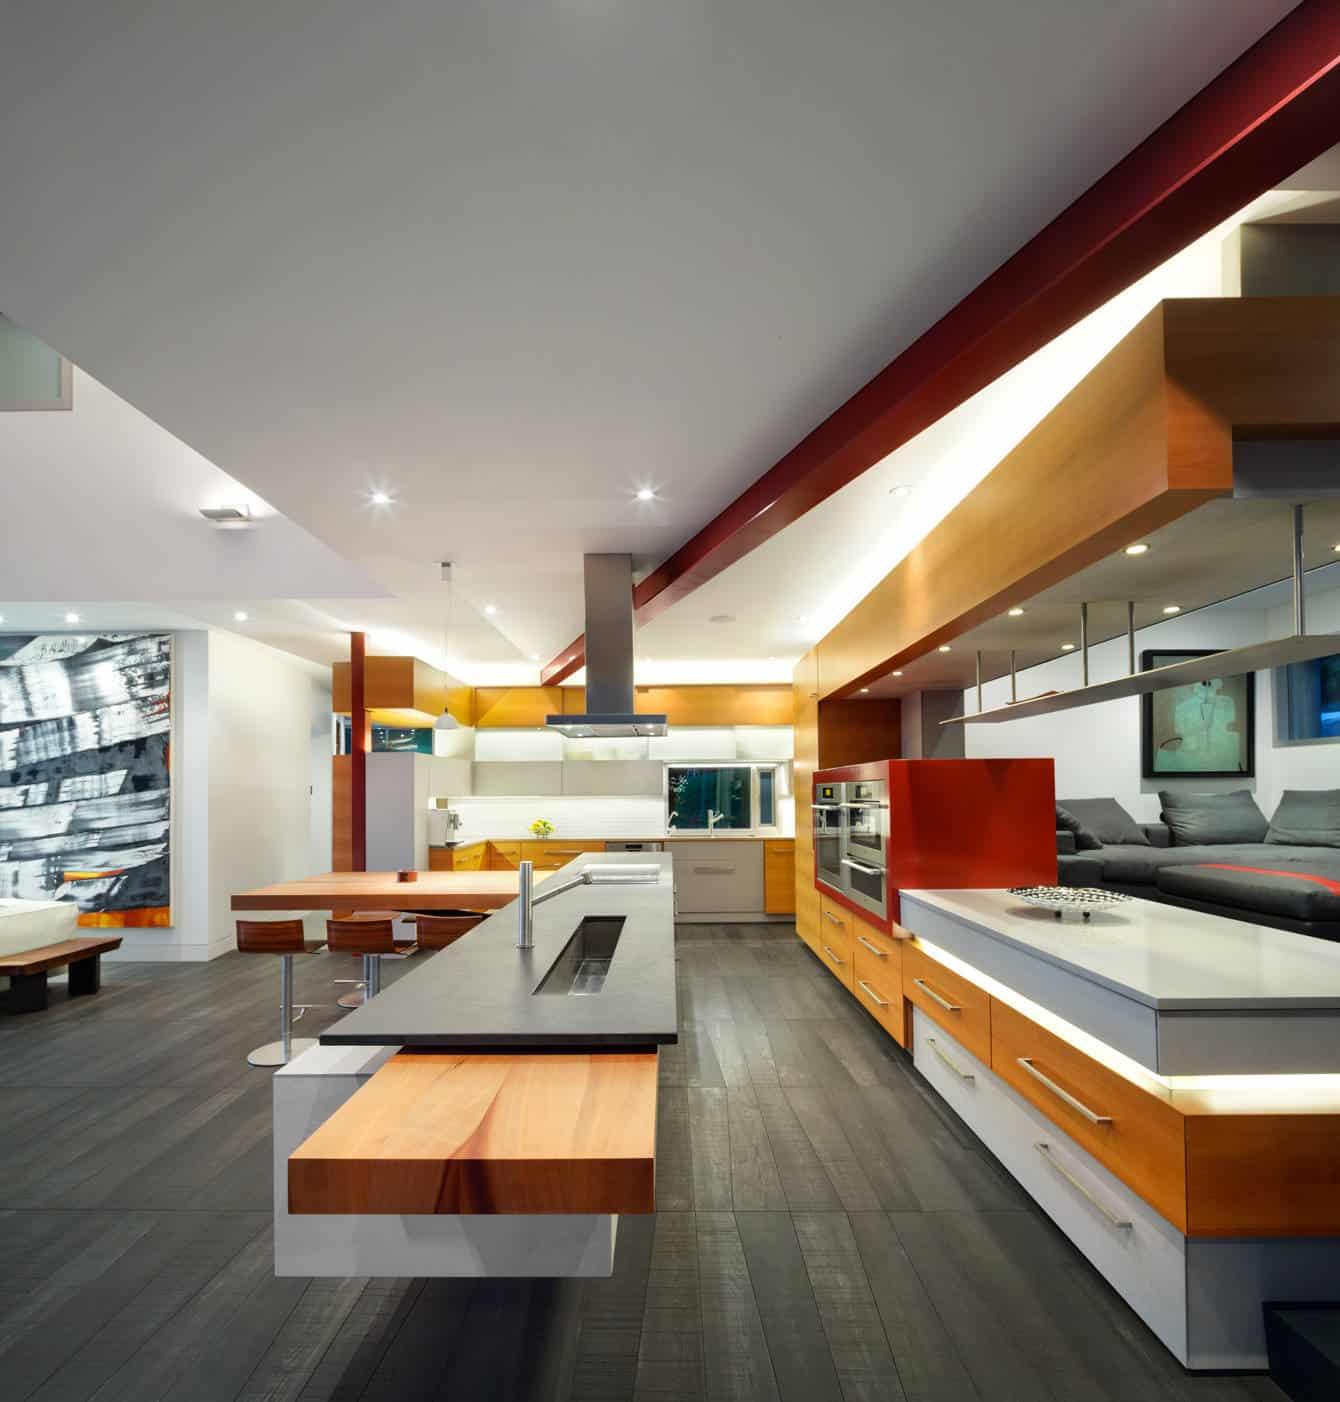 Gulf Islands Residence-AA Robins Architect-12-1 Kindesign